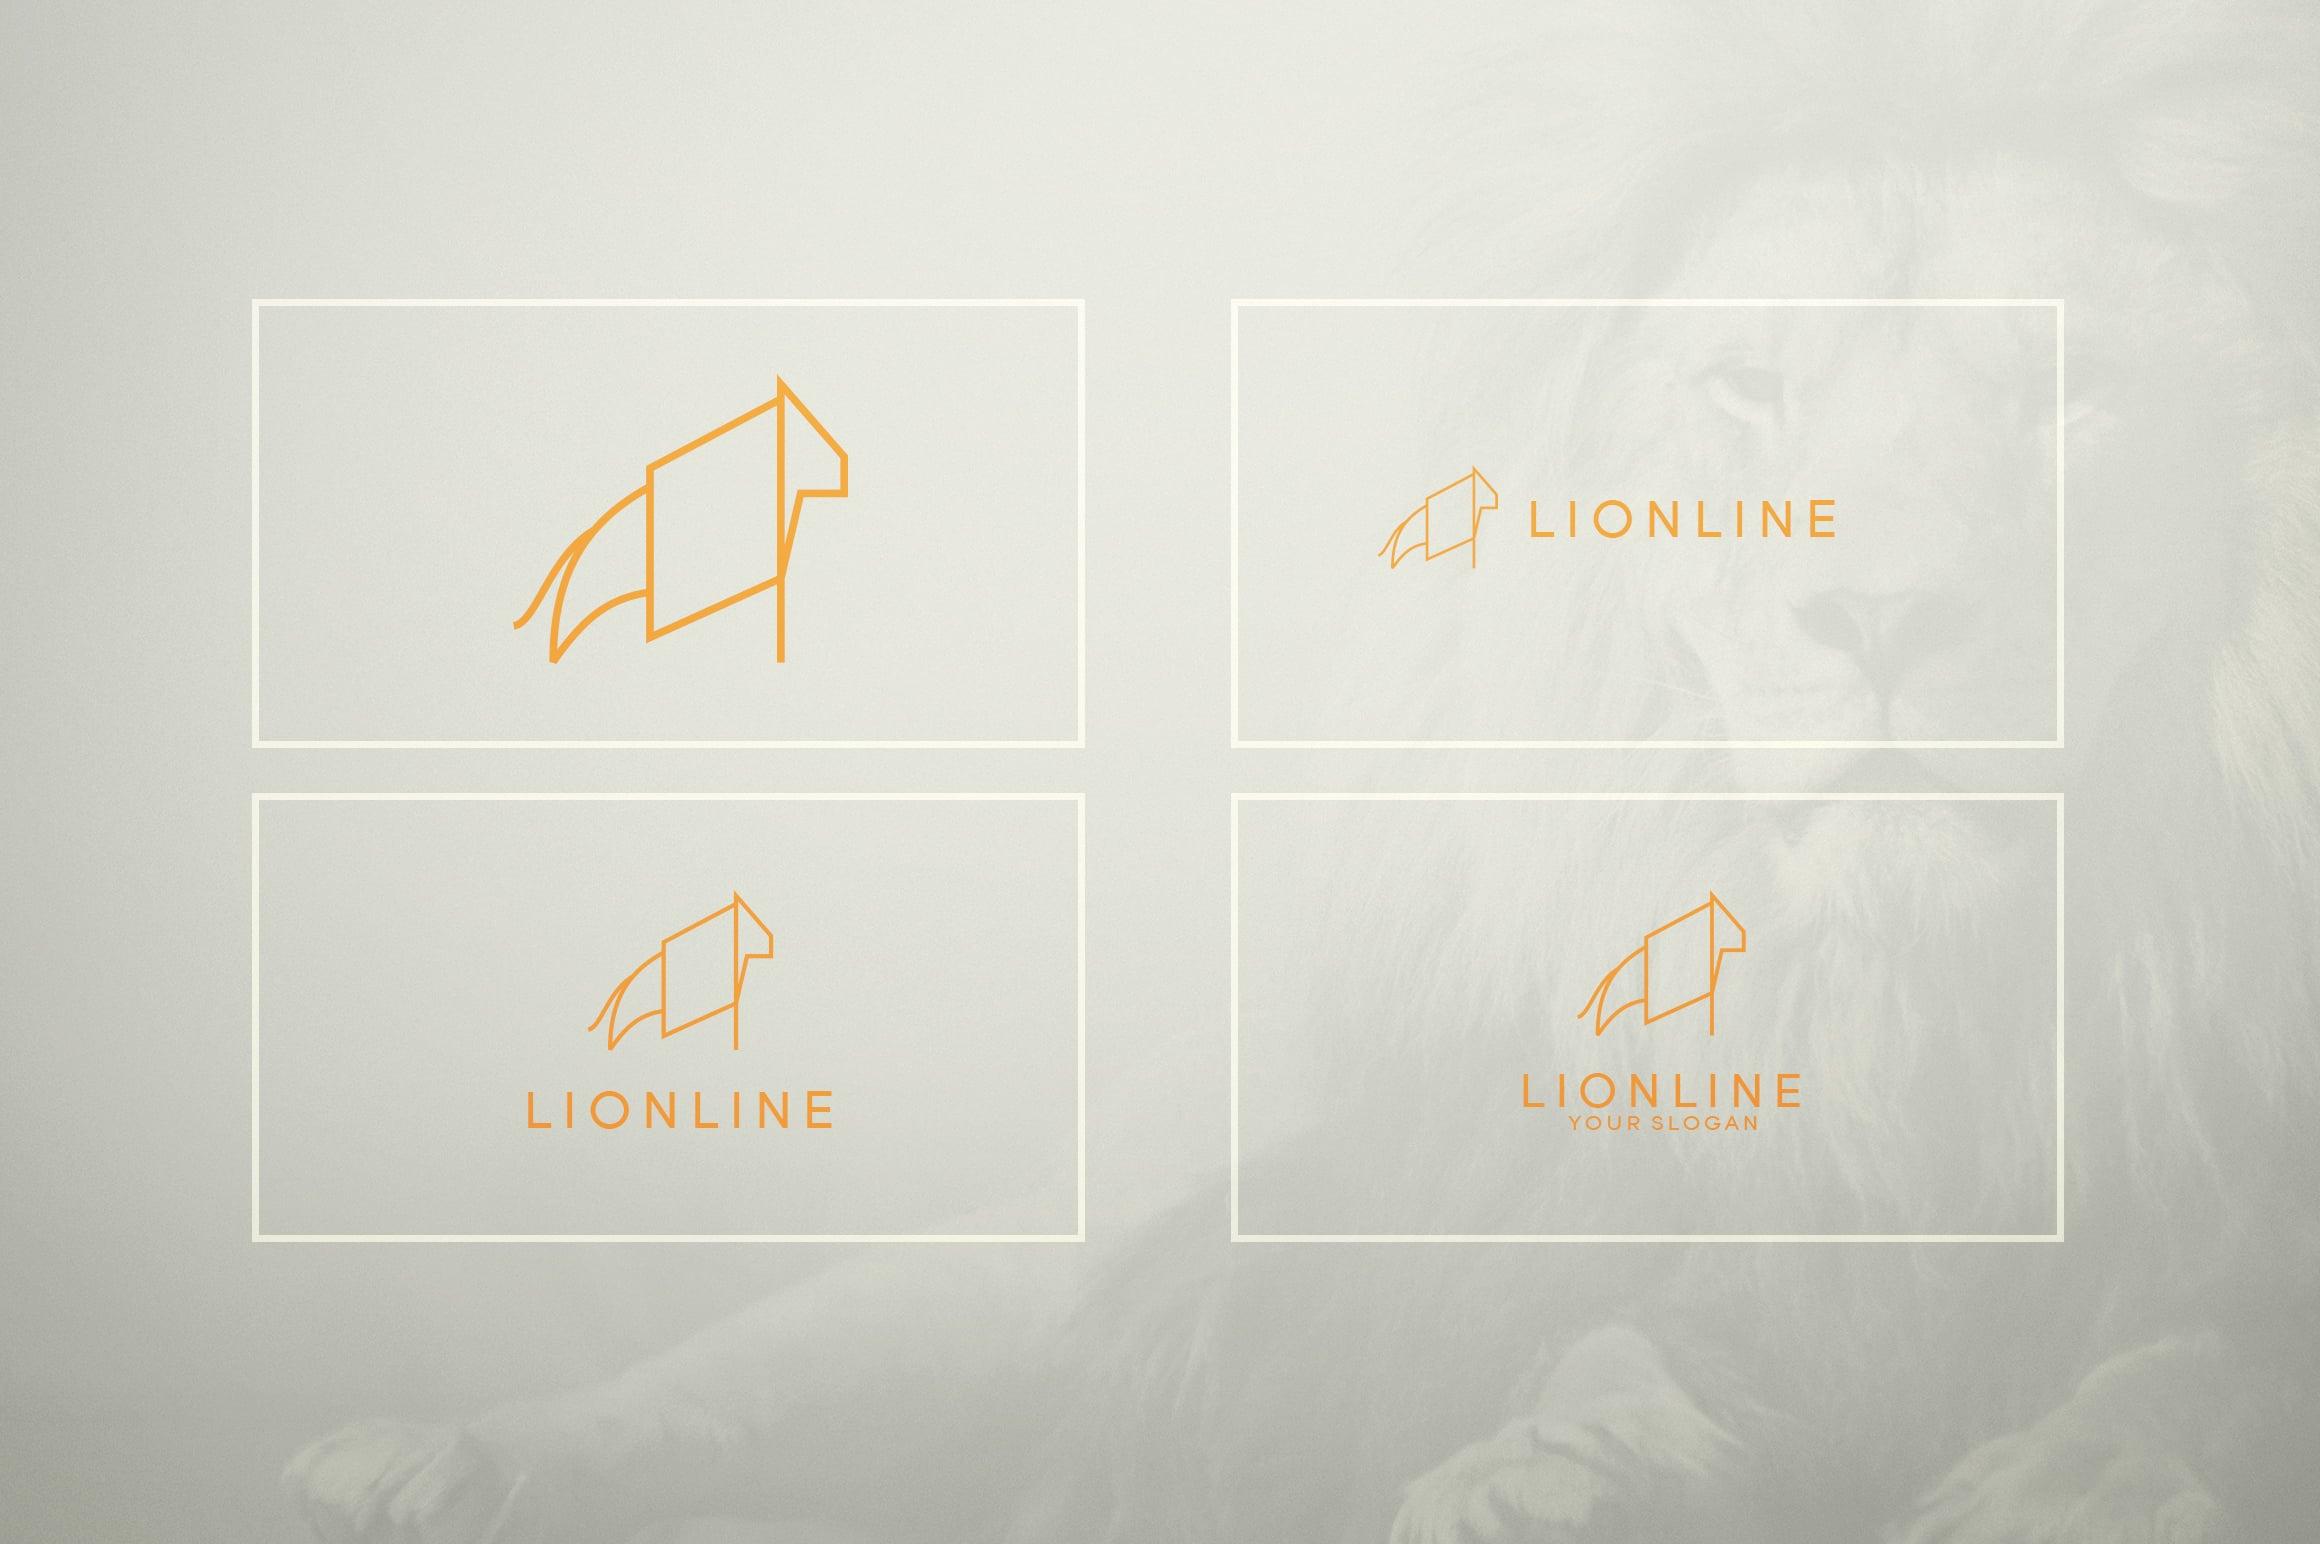 17 Geometric Animal Icons and Logos - 19